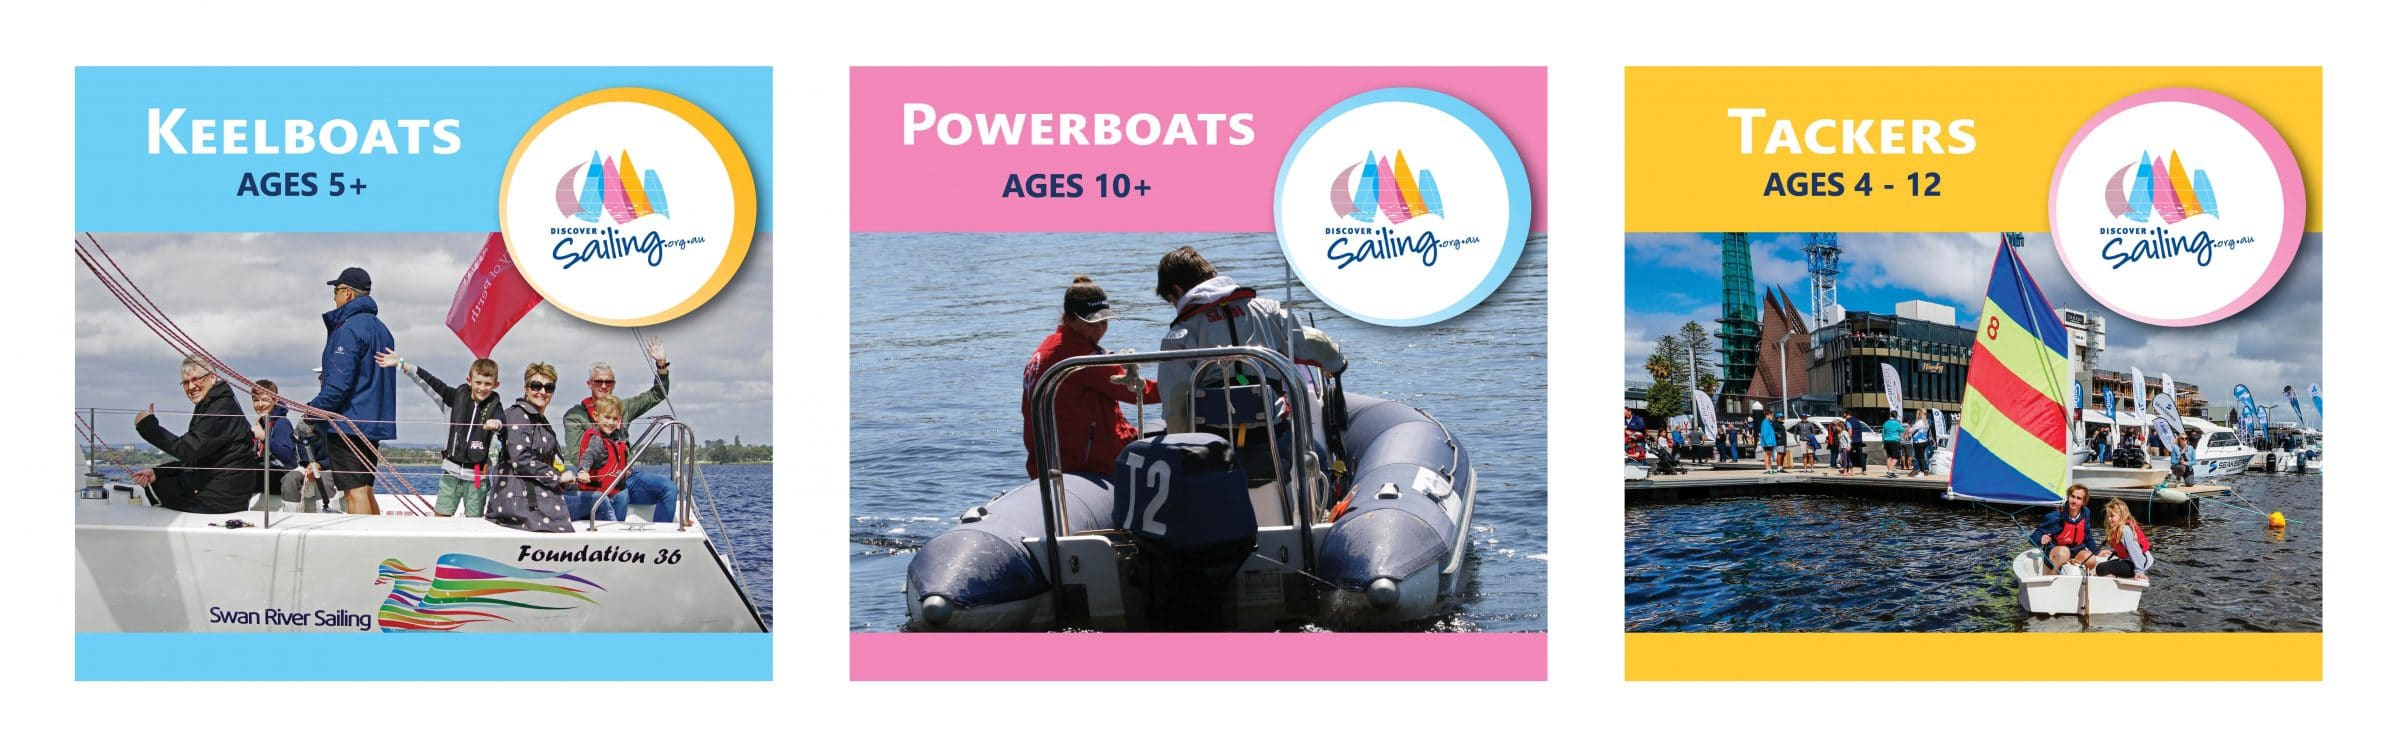 keelboats powerboats and tackers at the 2018 perth international boat show